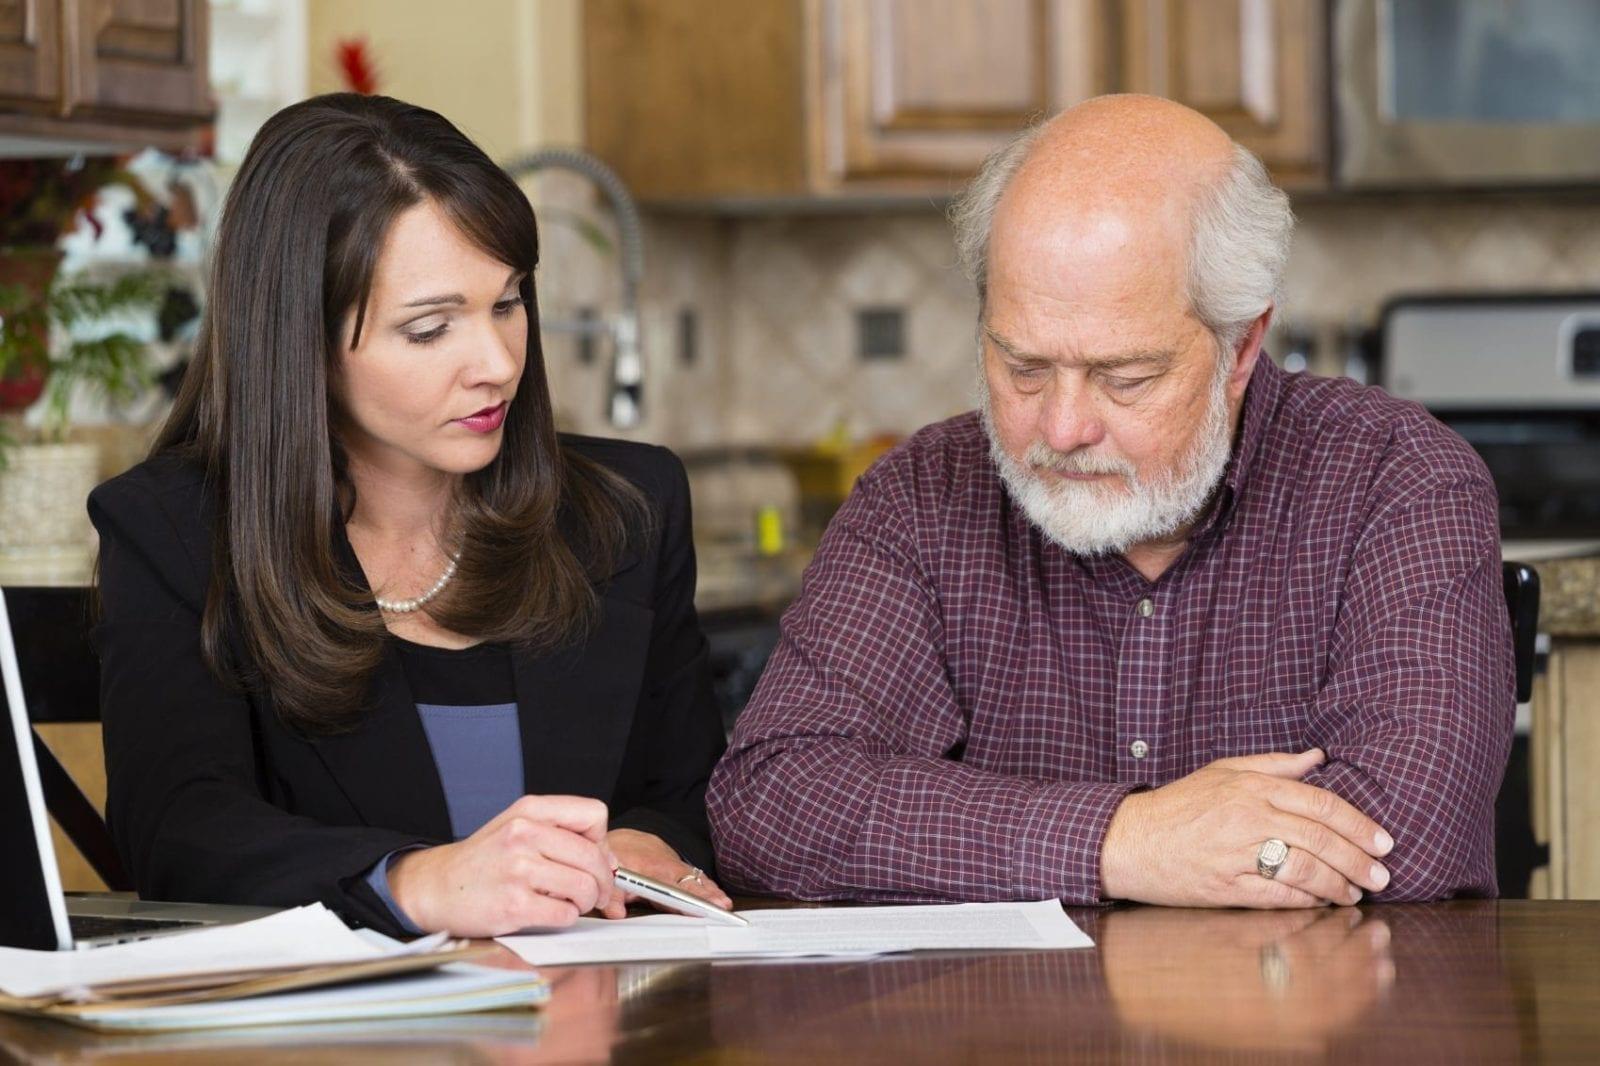 Female Attorney Advising Elderly Male Client Stock Photo